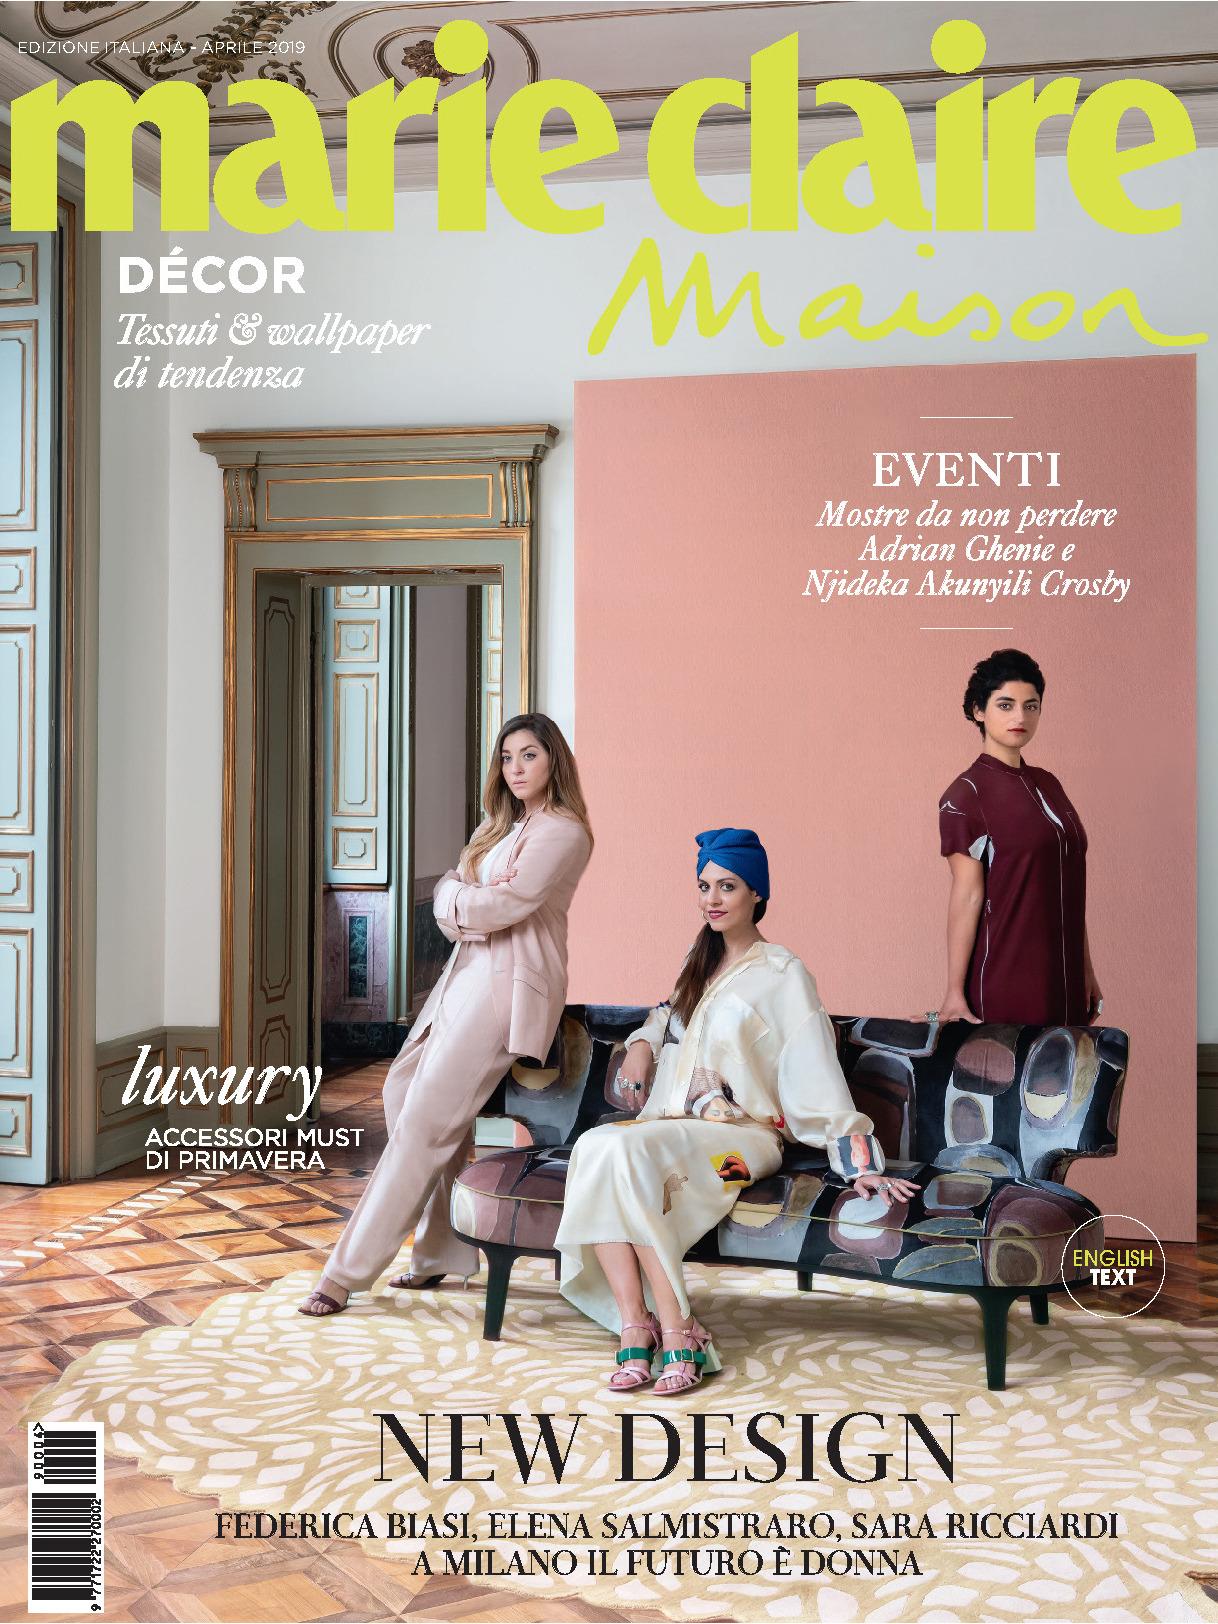 《Marie Claire maison》意大利版时尚室内设计杂志2019年04月号